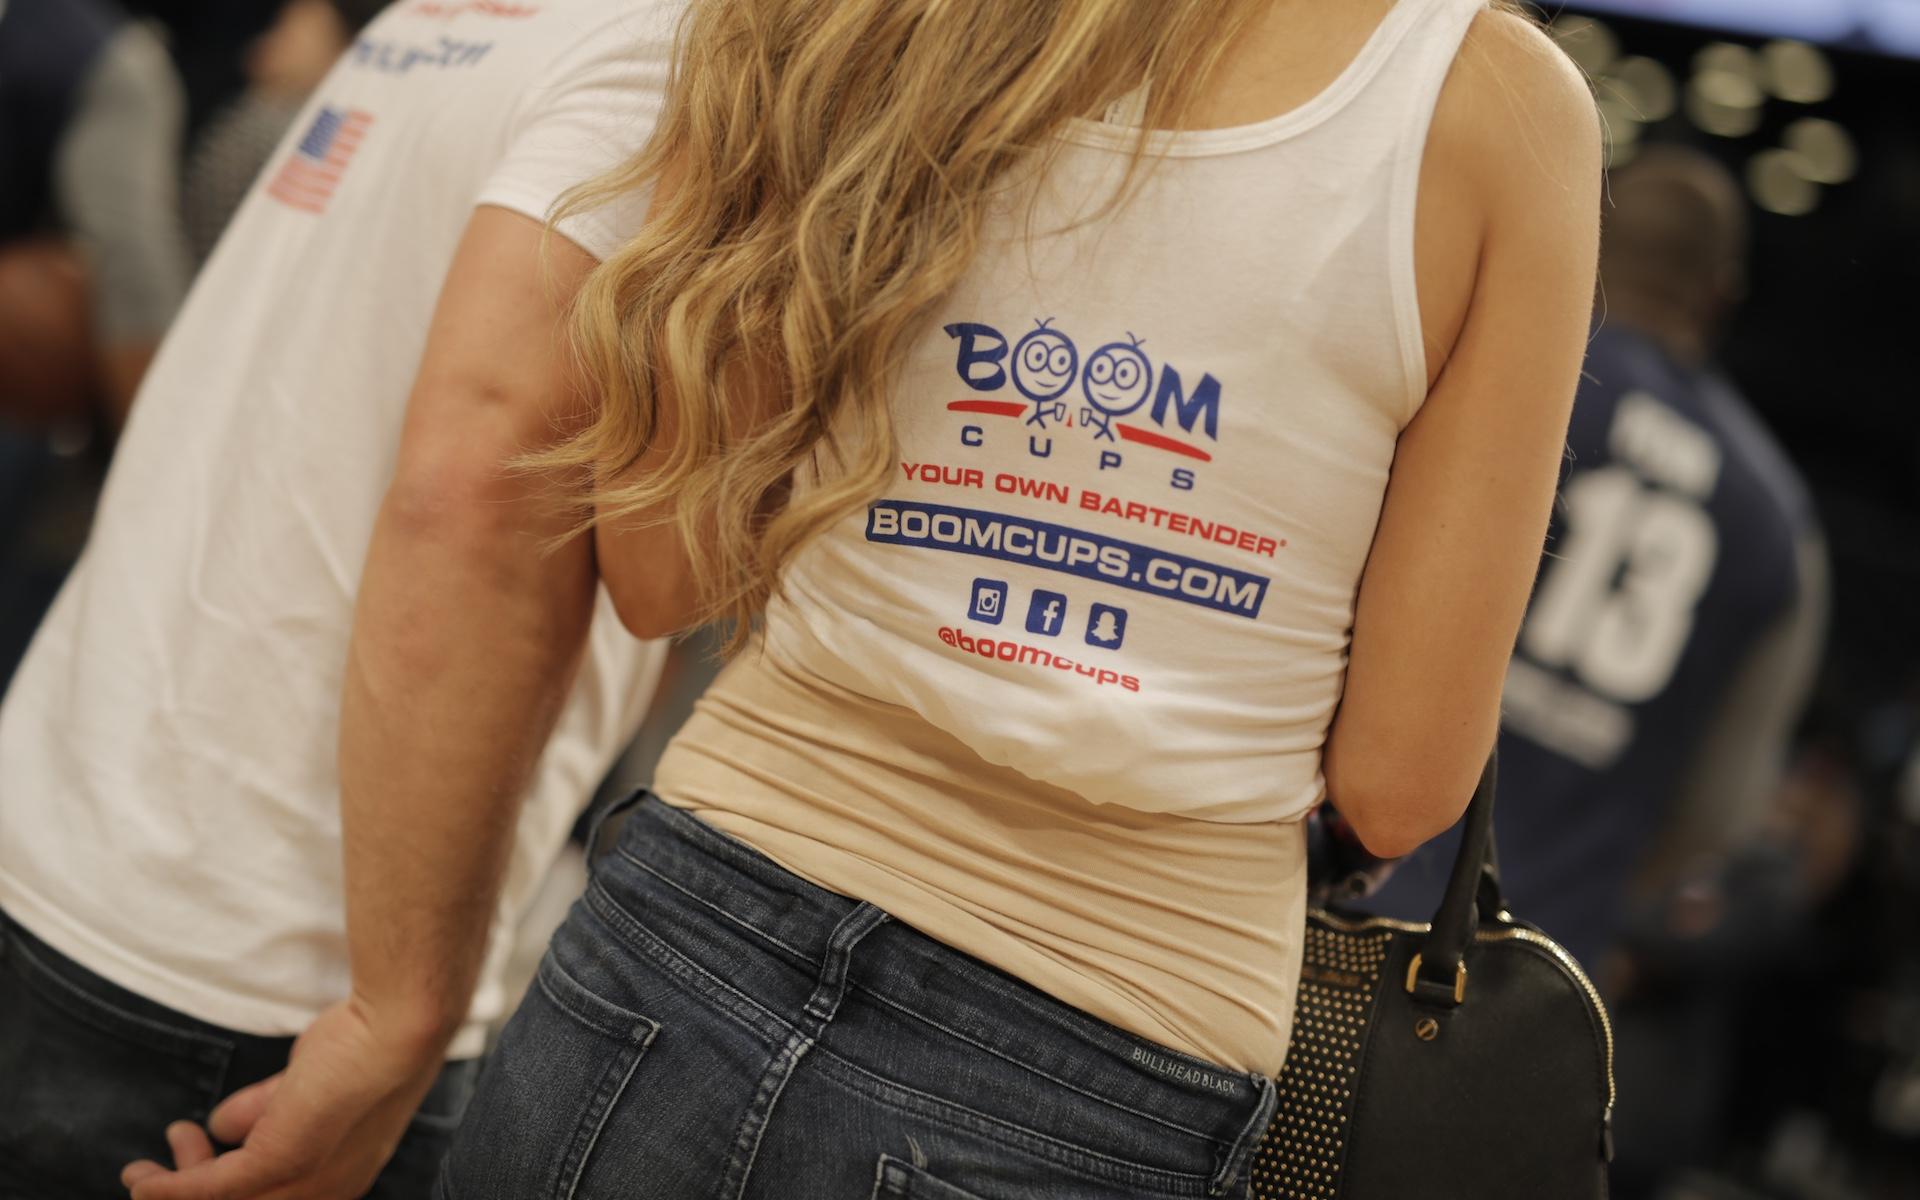 Boom Cups Girl